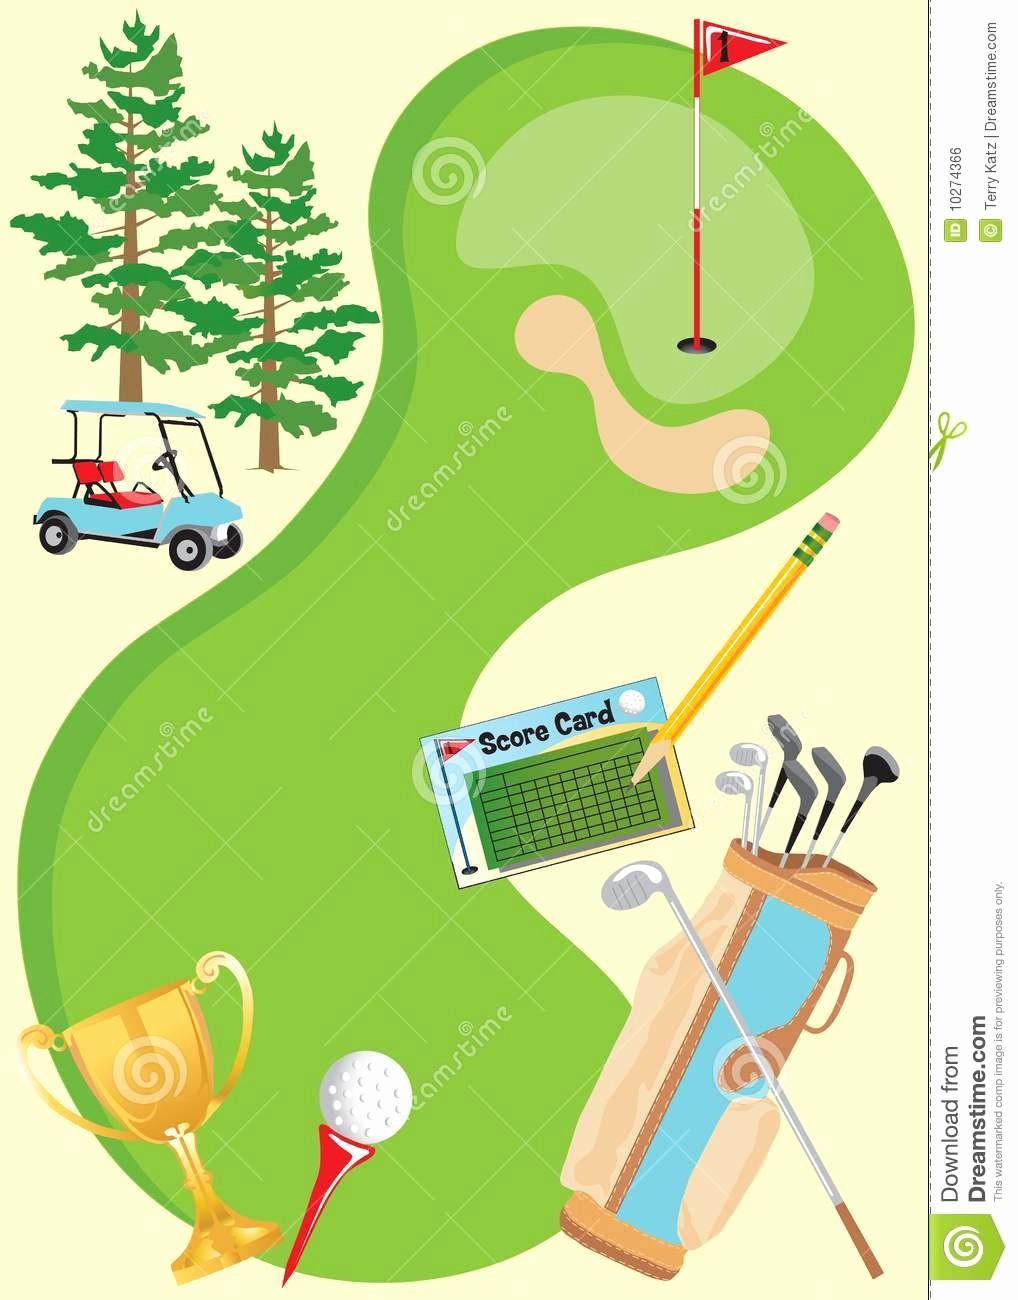 Golf tournament Invitation Template Free Unique Golf Invitation Templates